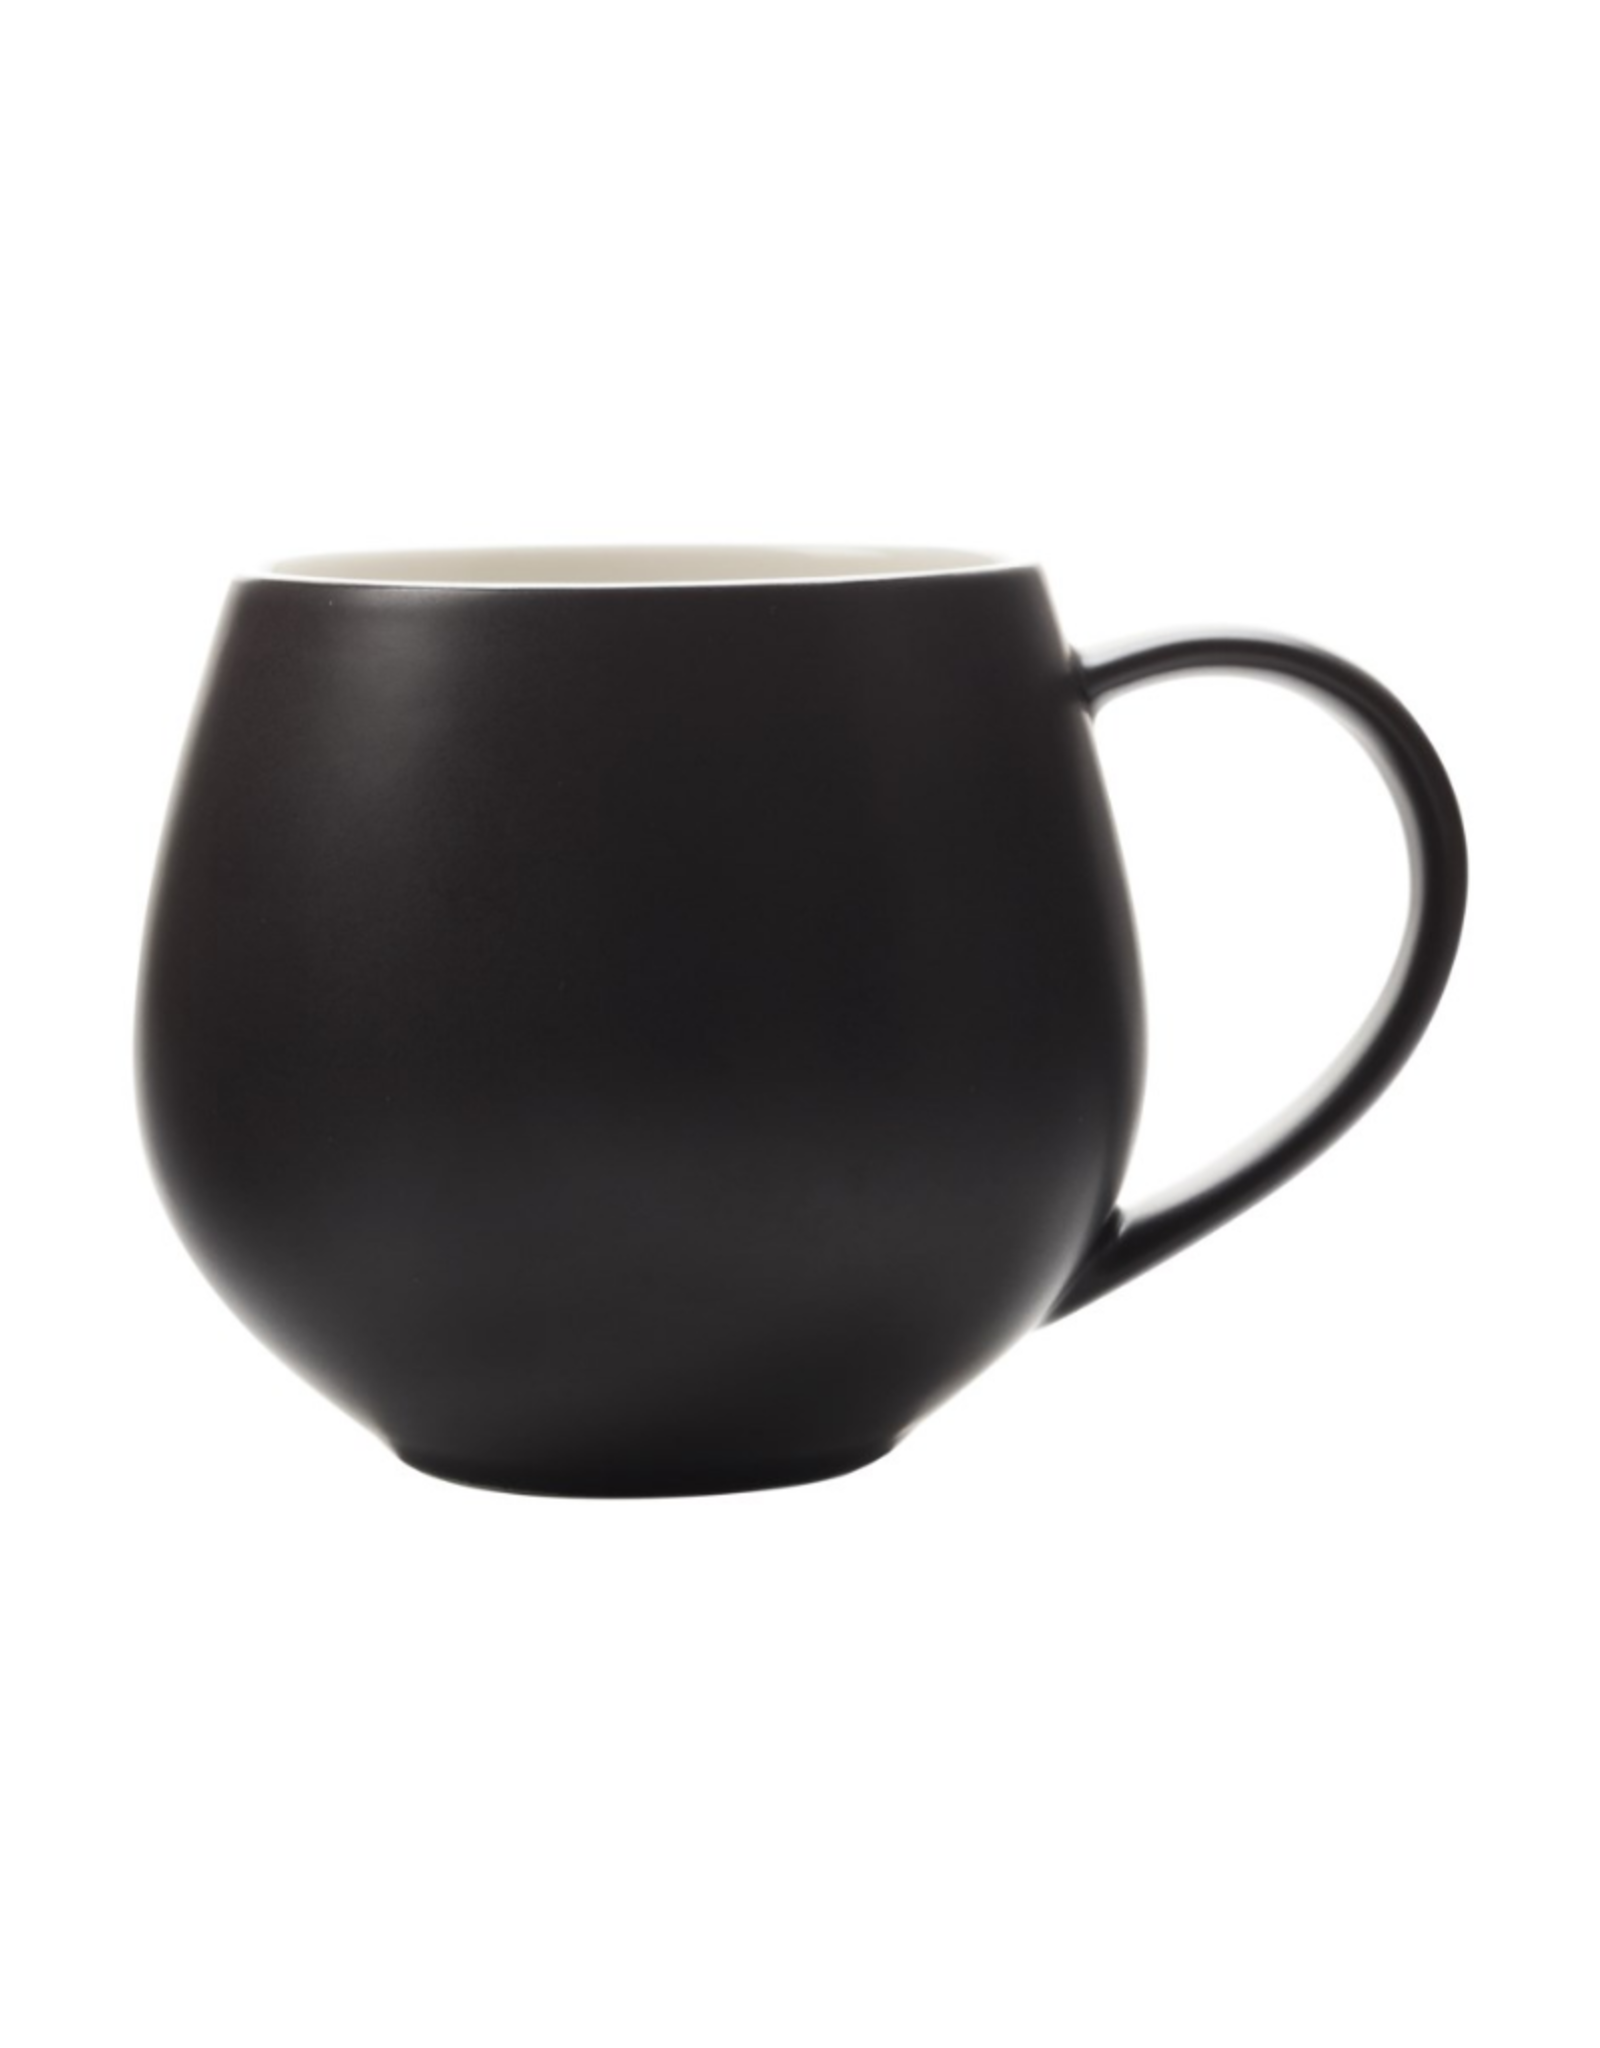 Maxwell Williams Tasse 'Tint Snug' 450ML noire